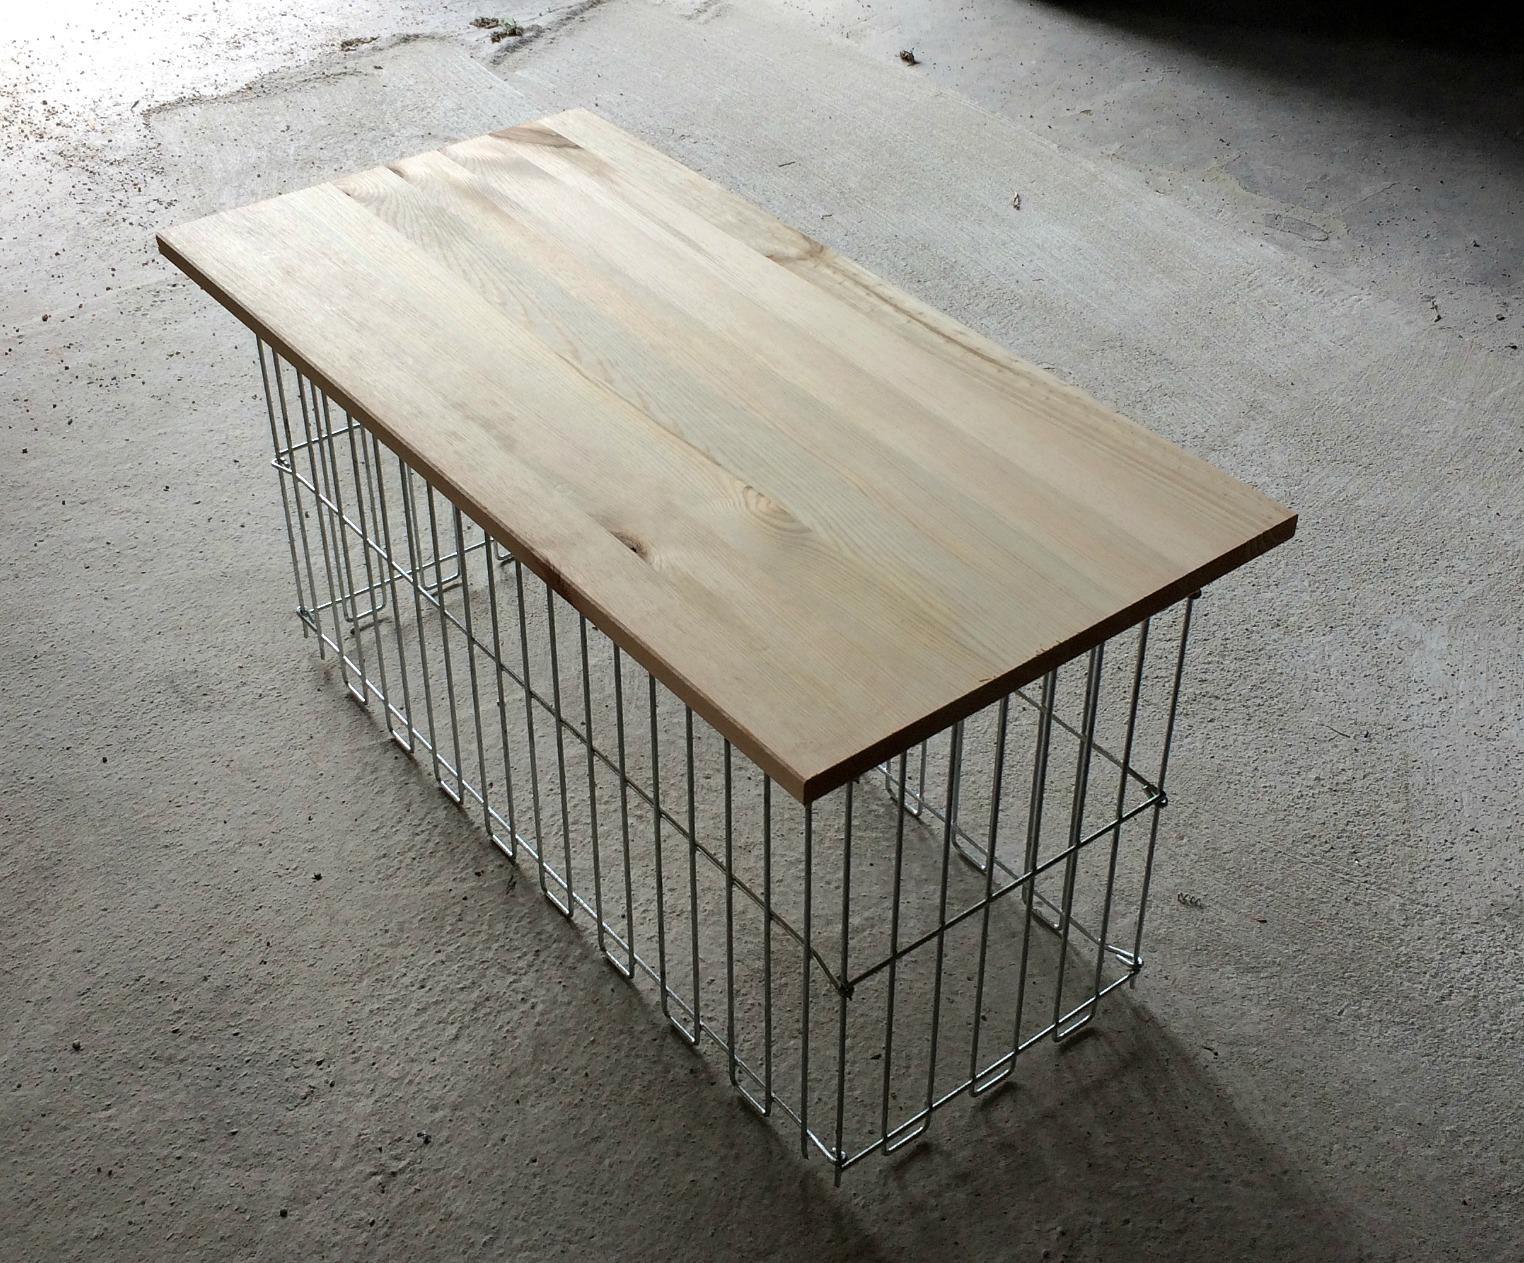 лавочка (скамейка) из габиона